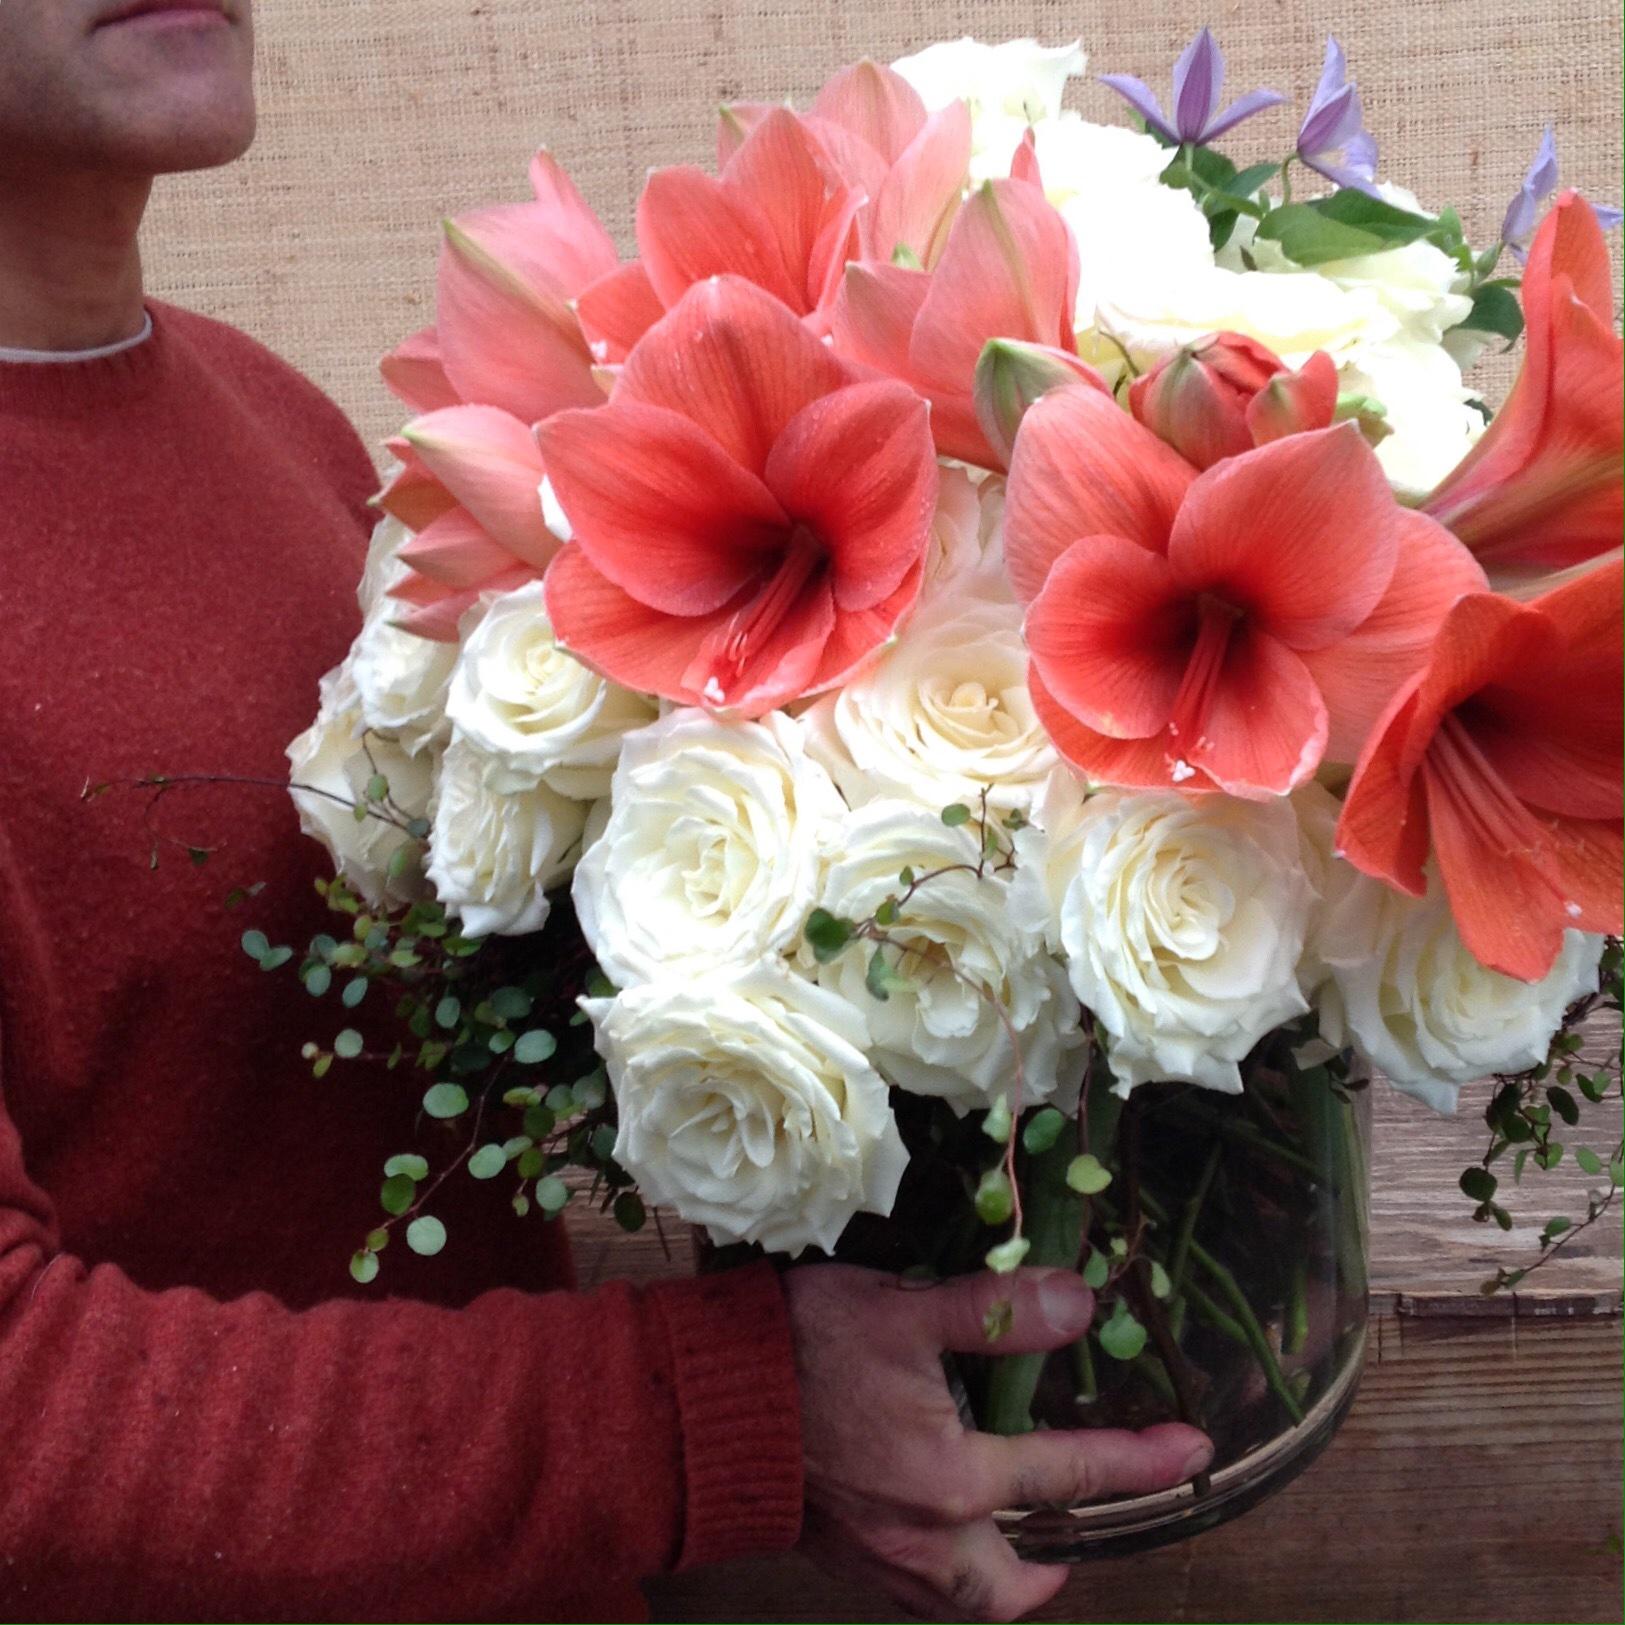 White Roses with Amaryllis makes a big lush statement starting at $250